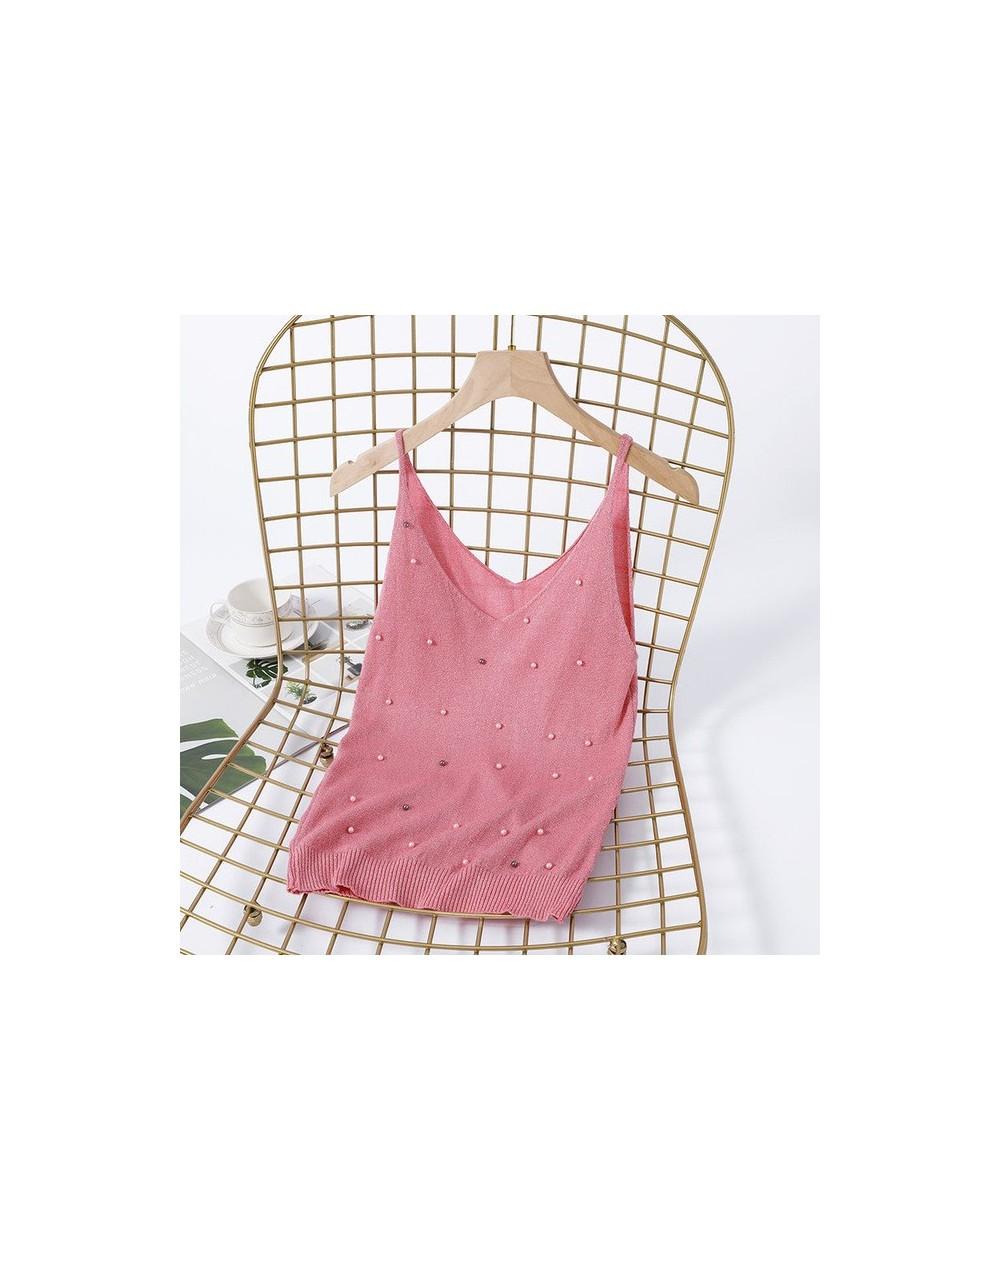 Crop Tops Women 2019 Sexy Knitted Tank Tops Gold Thread Top Vest Summer Camisole Women Streetwear Tank Top Fitness Femme T s...